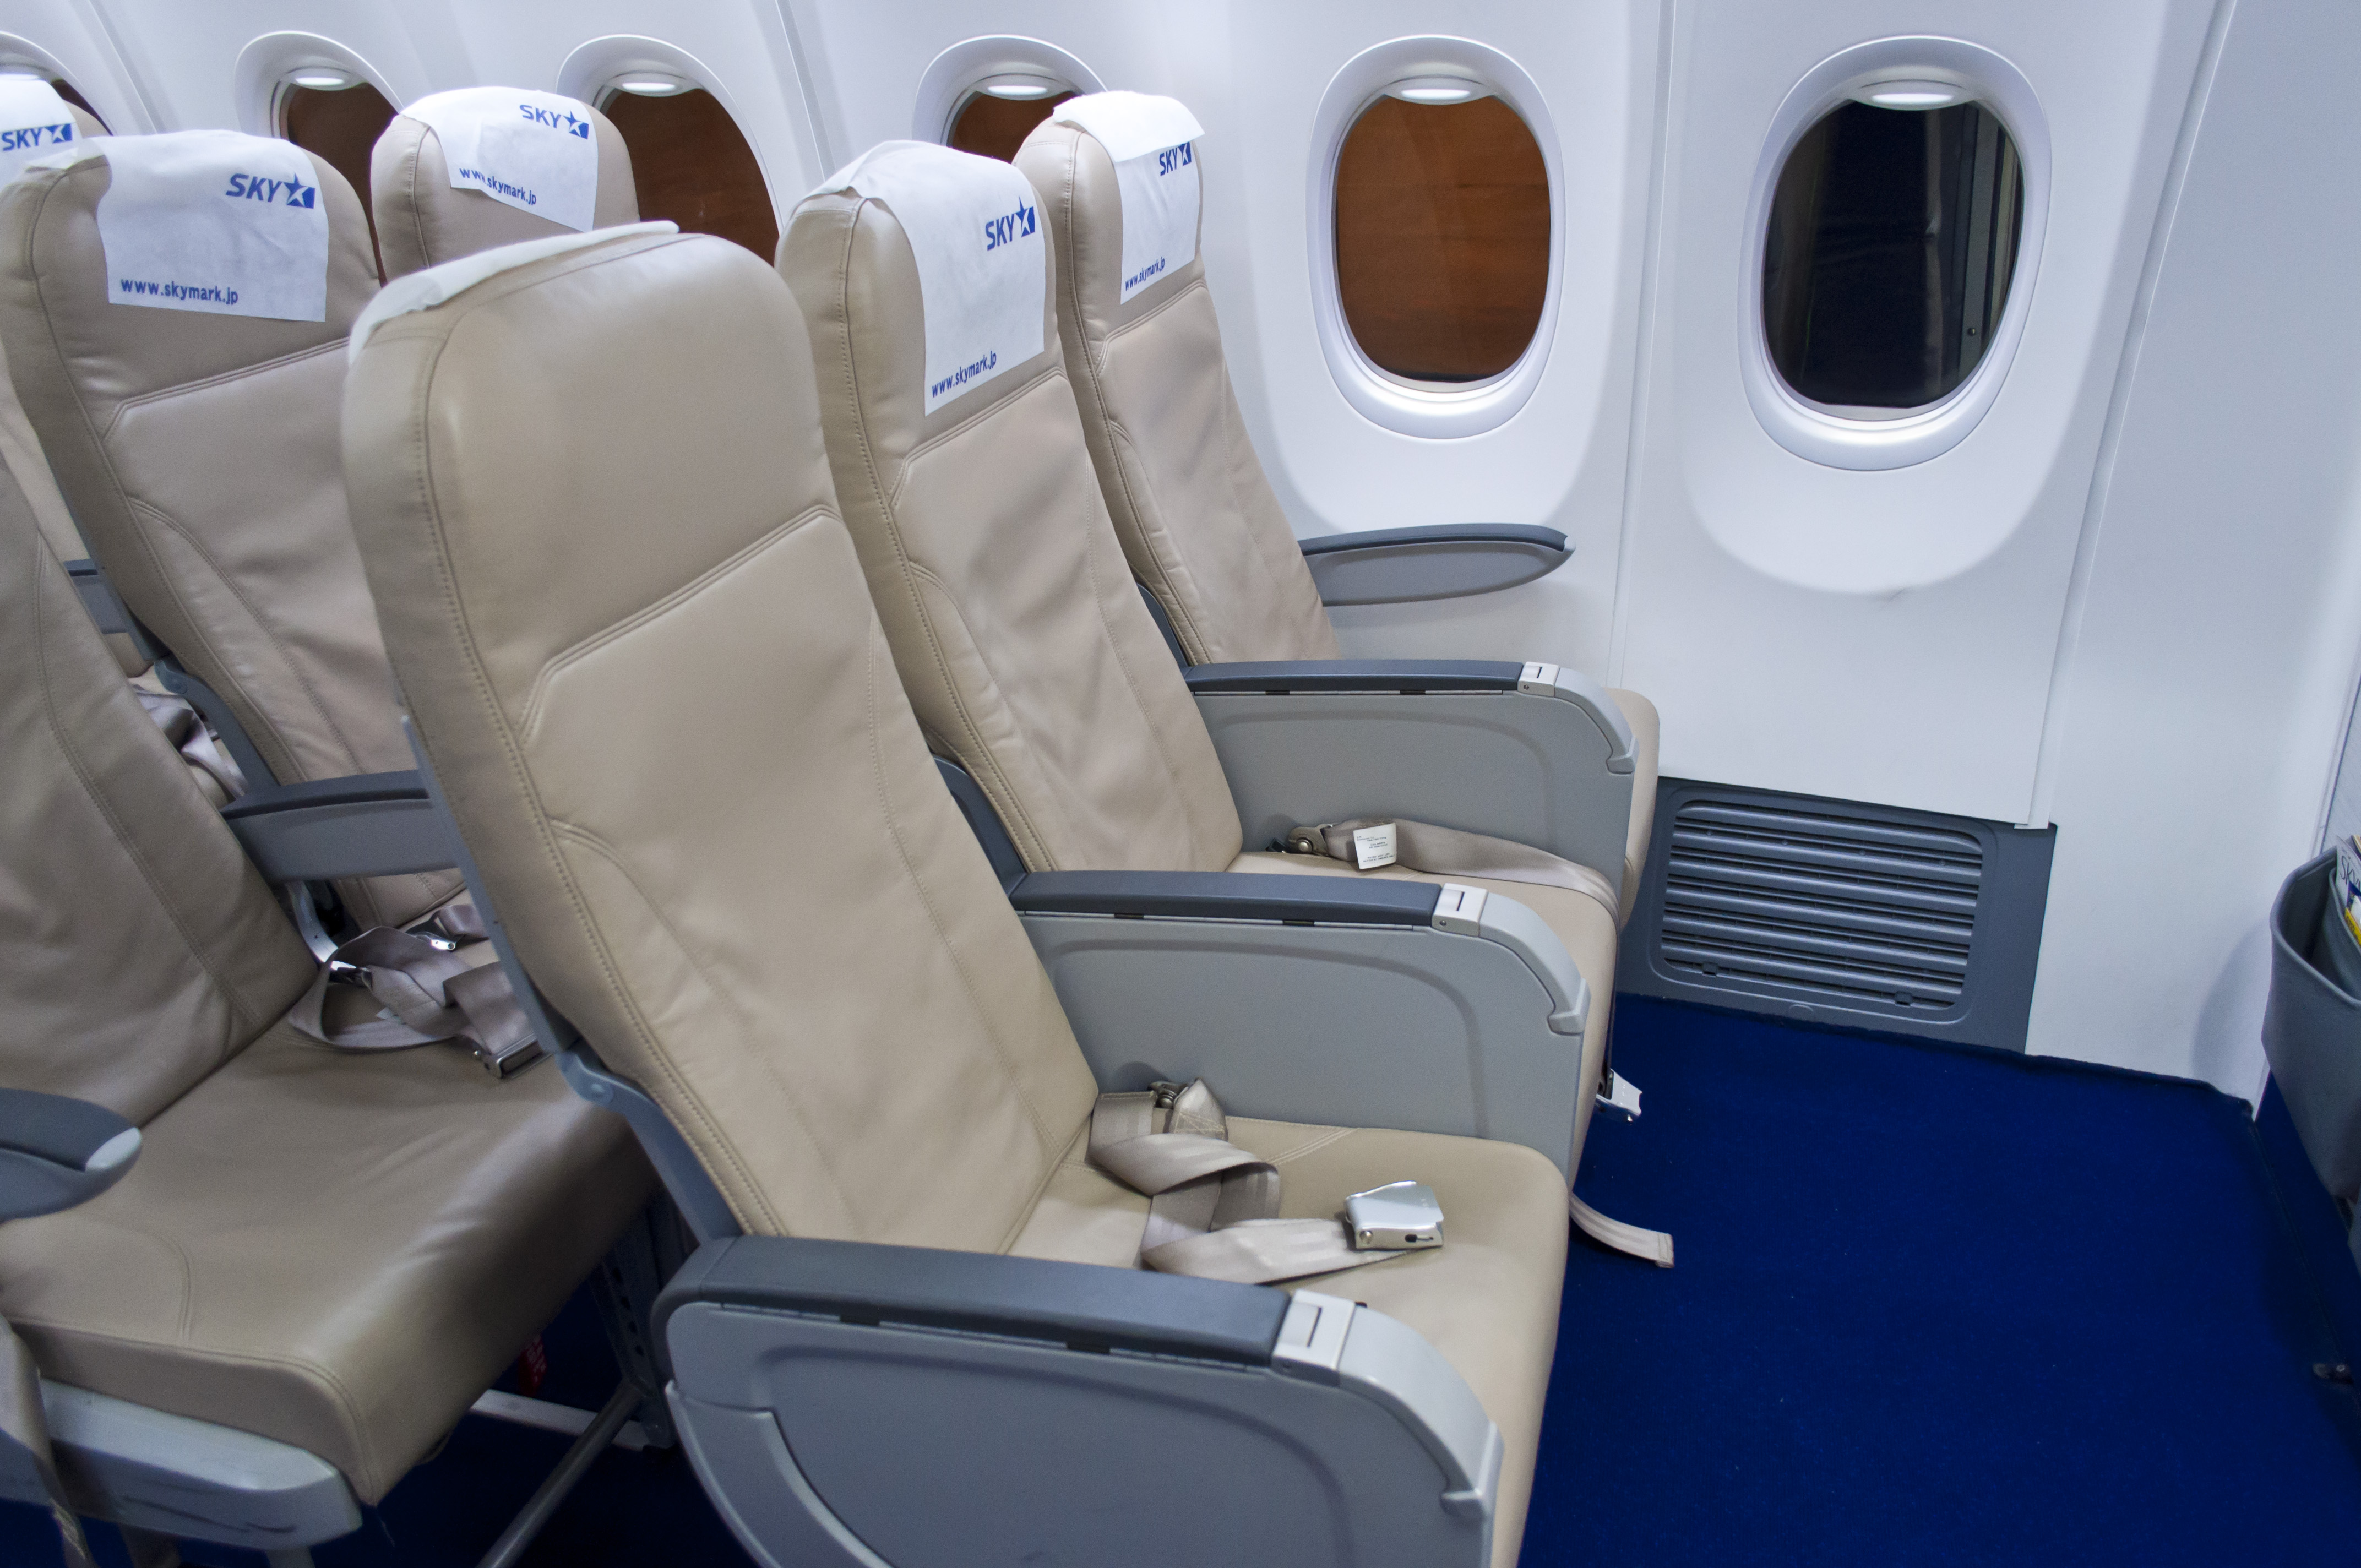 Boeing 737 Seat Boeing 737 800 Seat Boeing 737900 Seat 点力图库